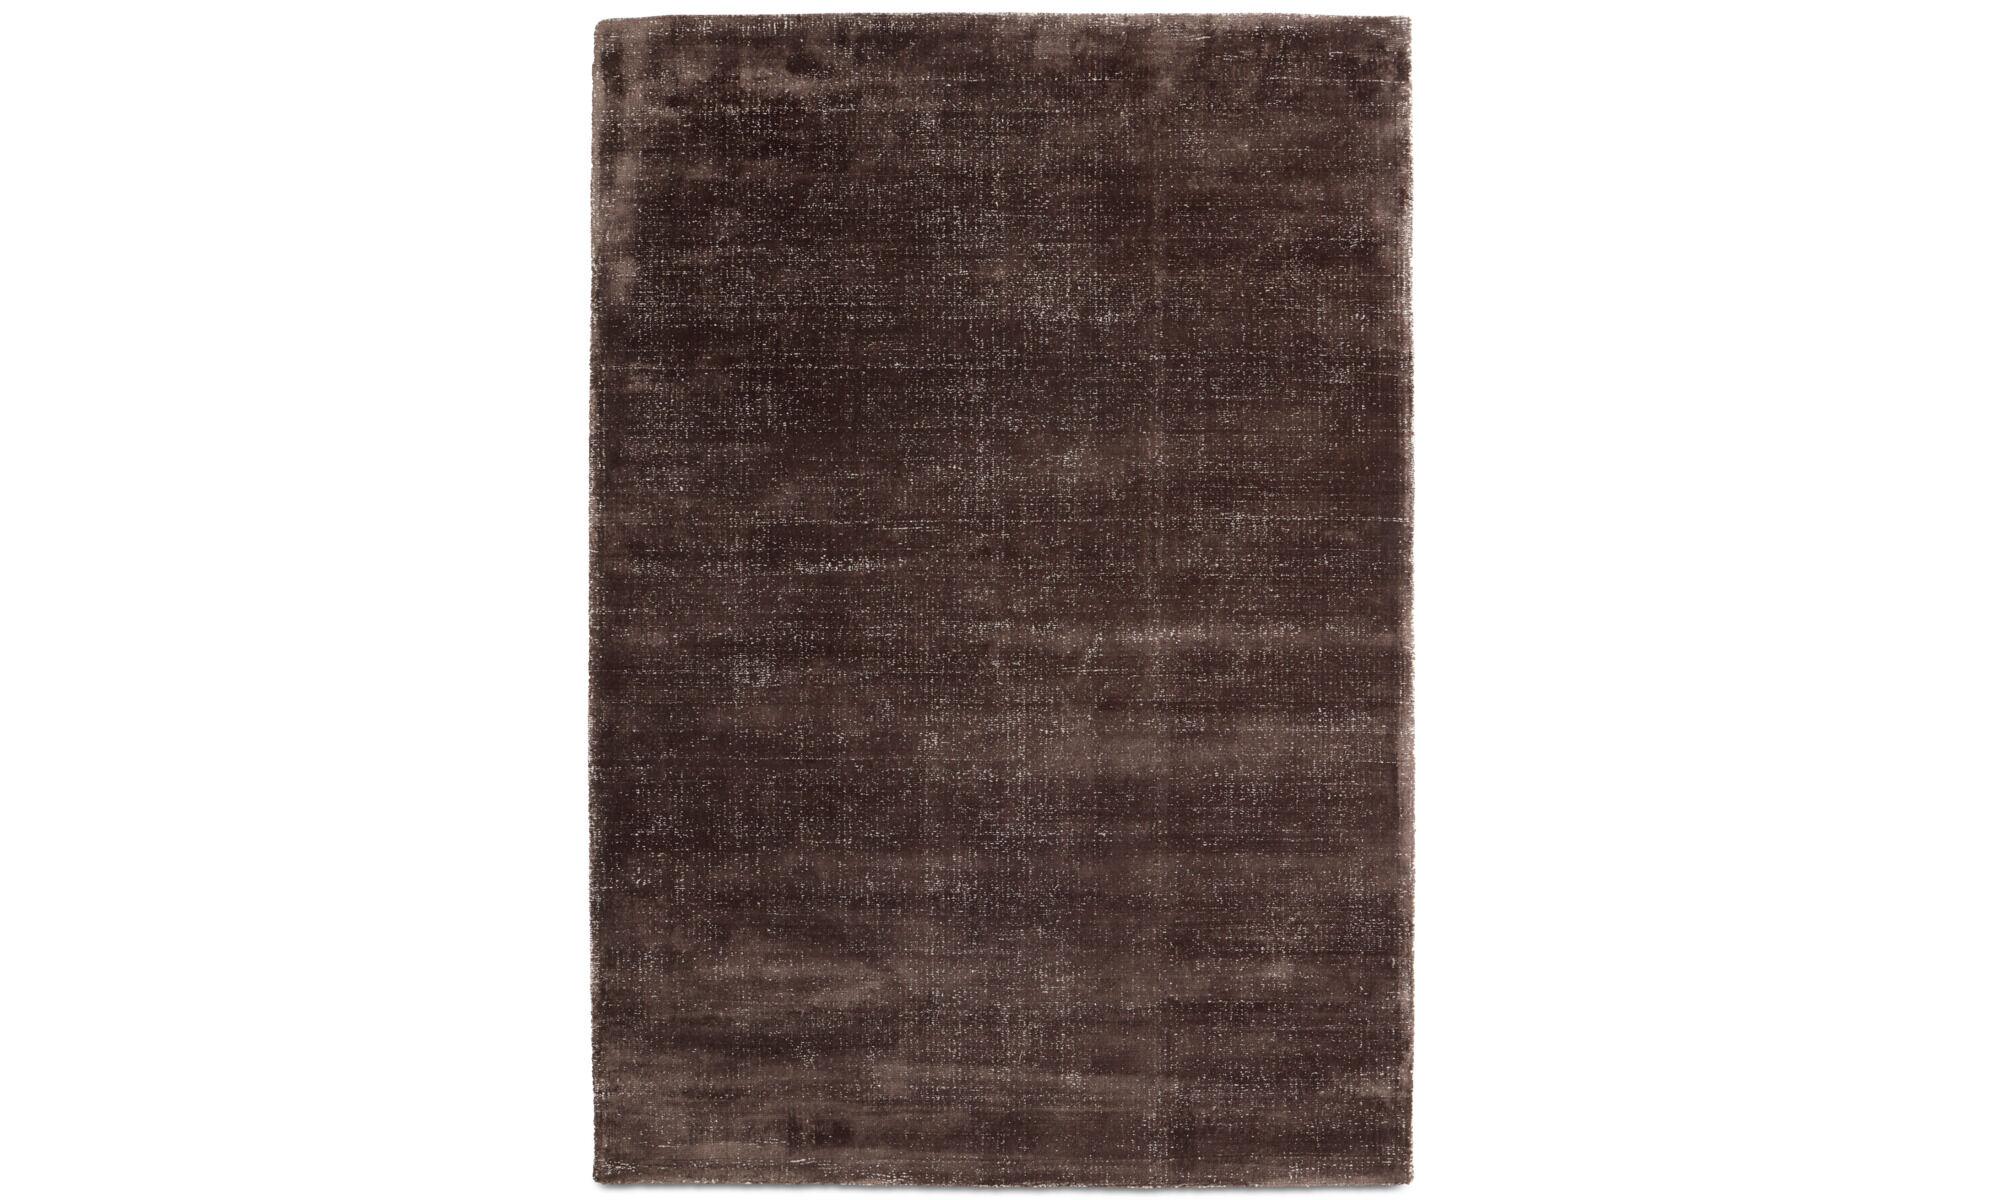 Simple rug - 30% OFF